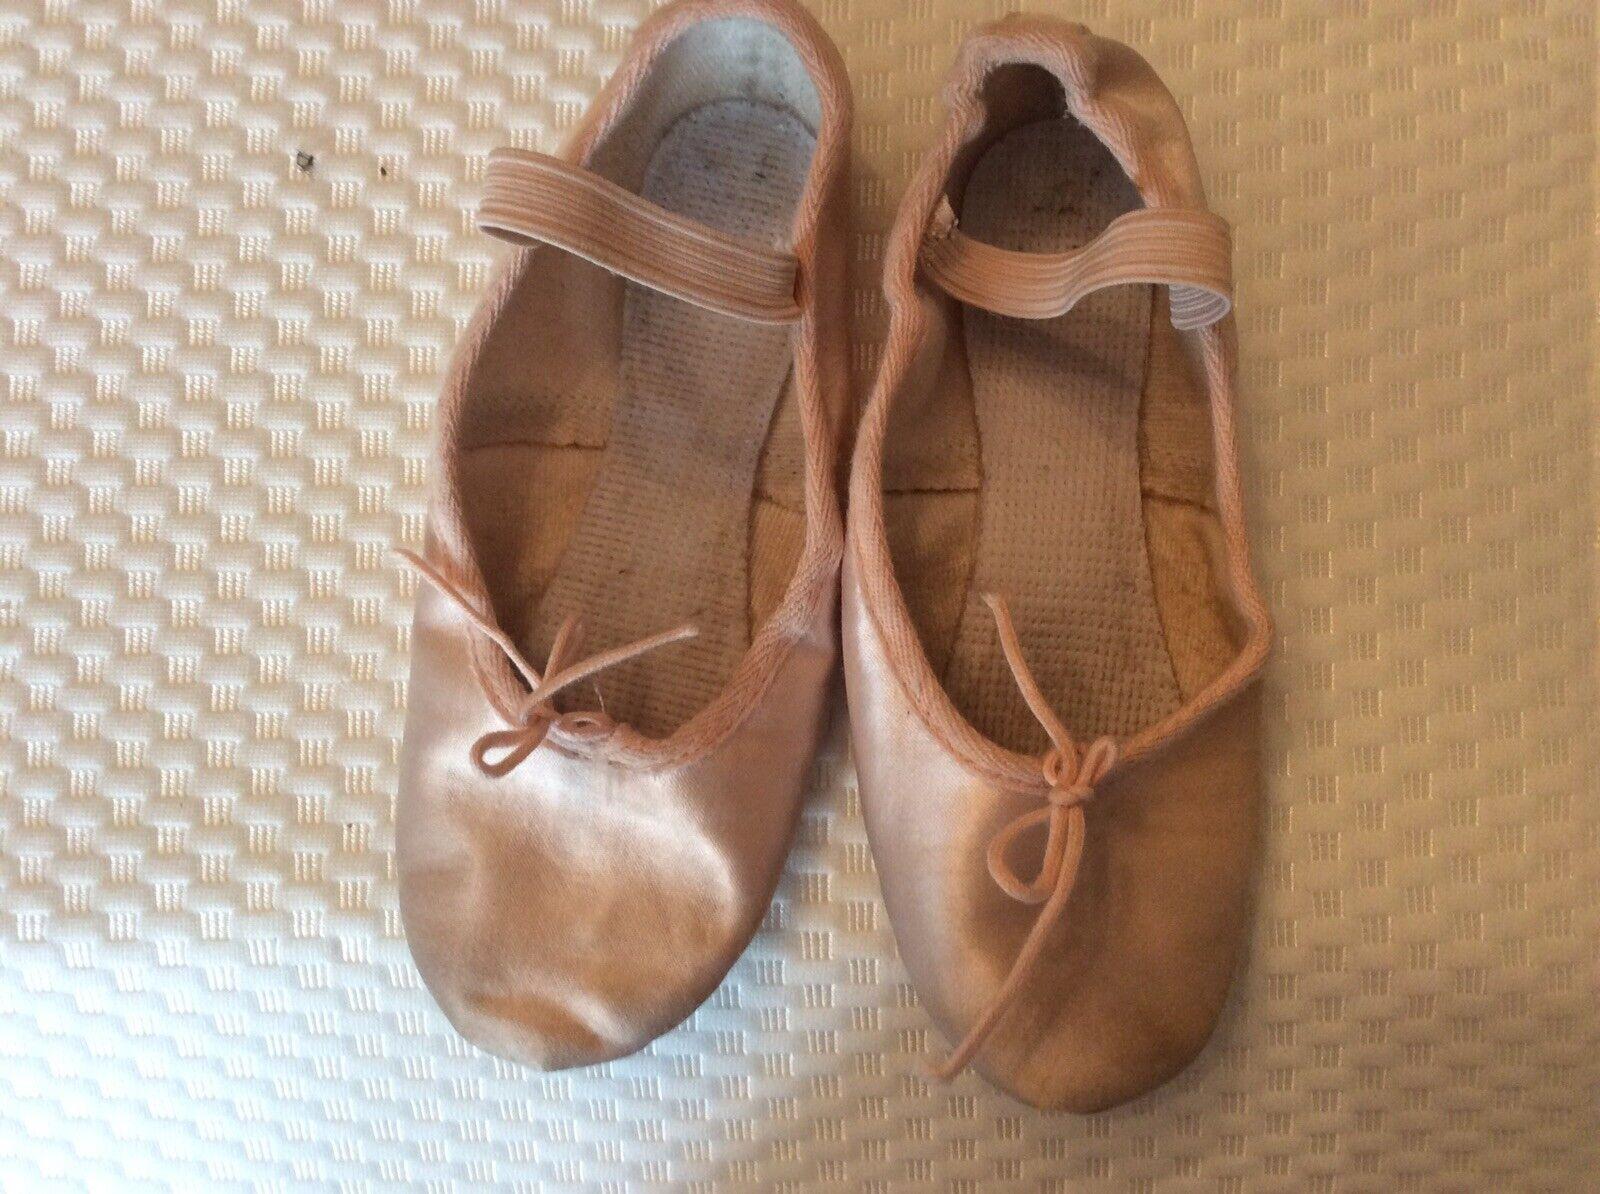 RV Ballet Shoes Size 1